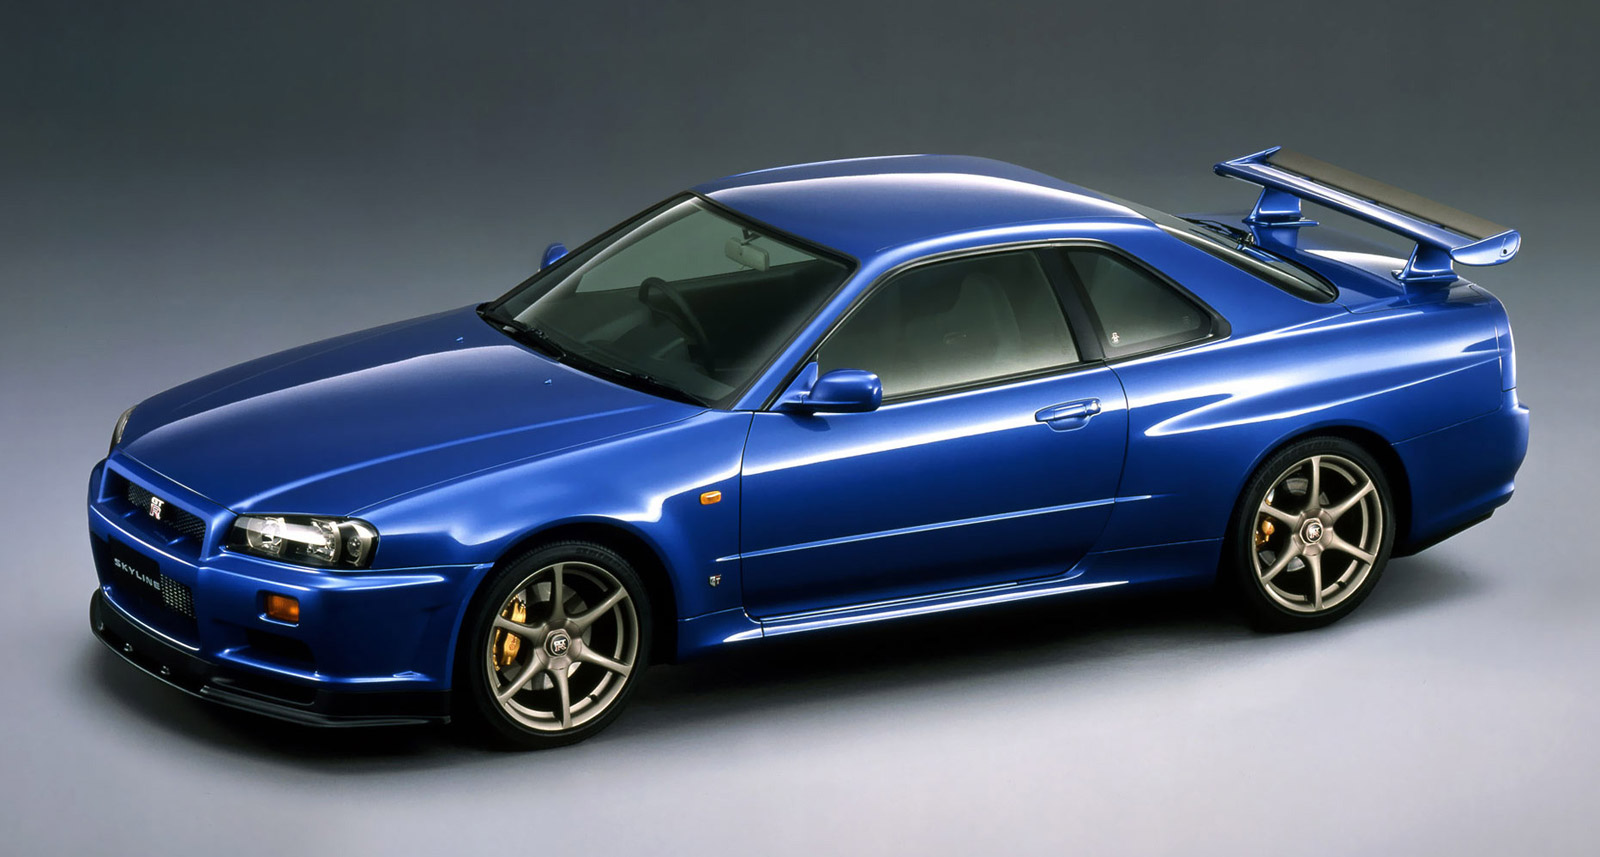 Fast & Furious GT-R, Ferrari 149M Project, Audi Q8 e-tron: Car News Headlines